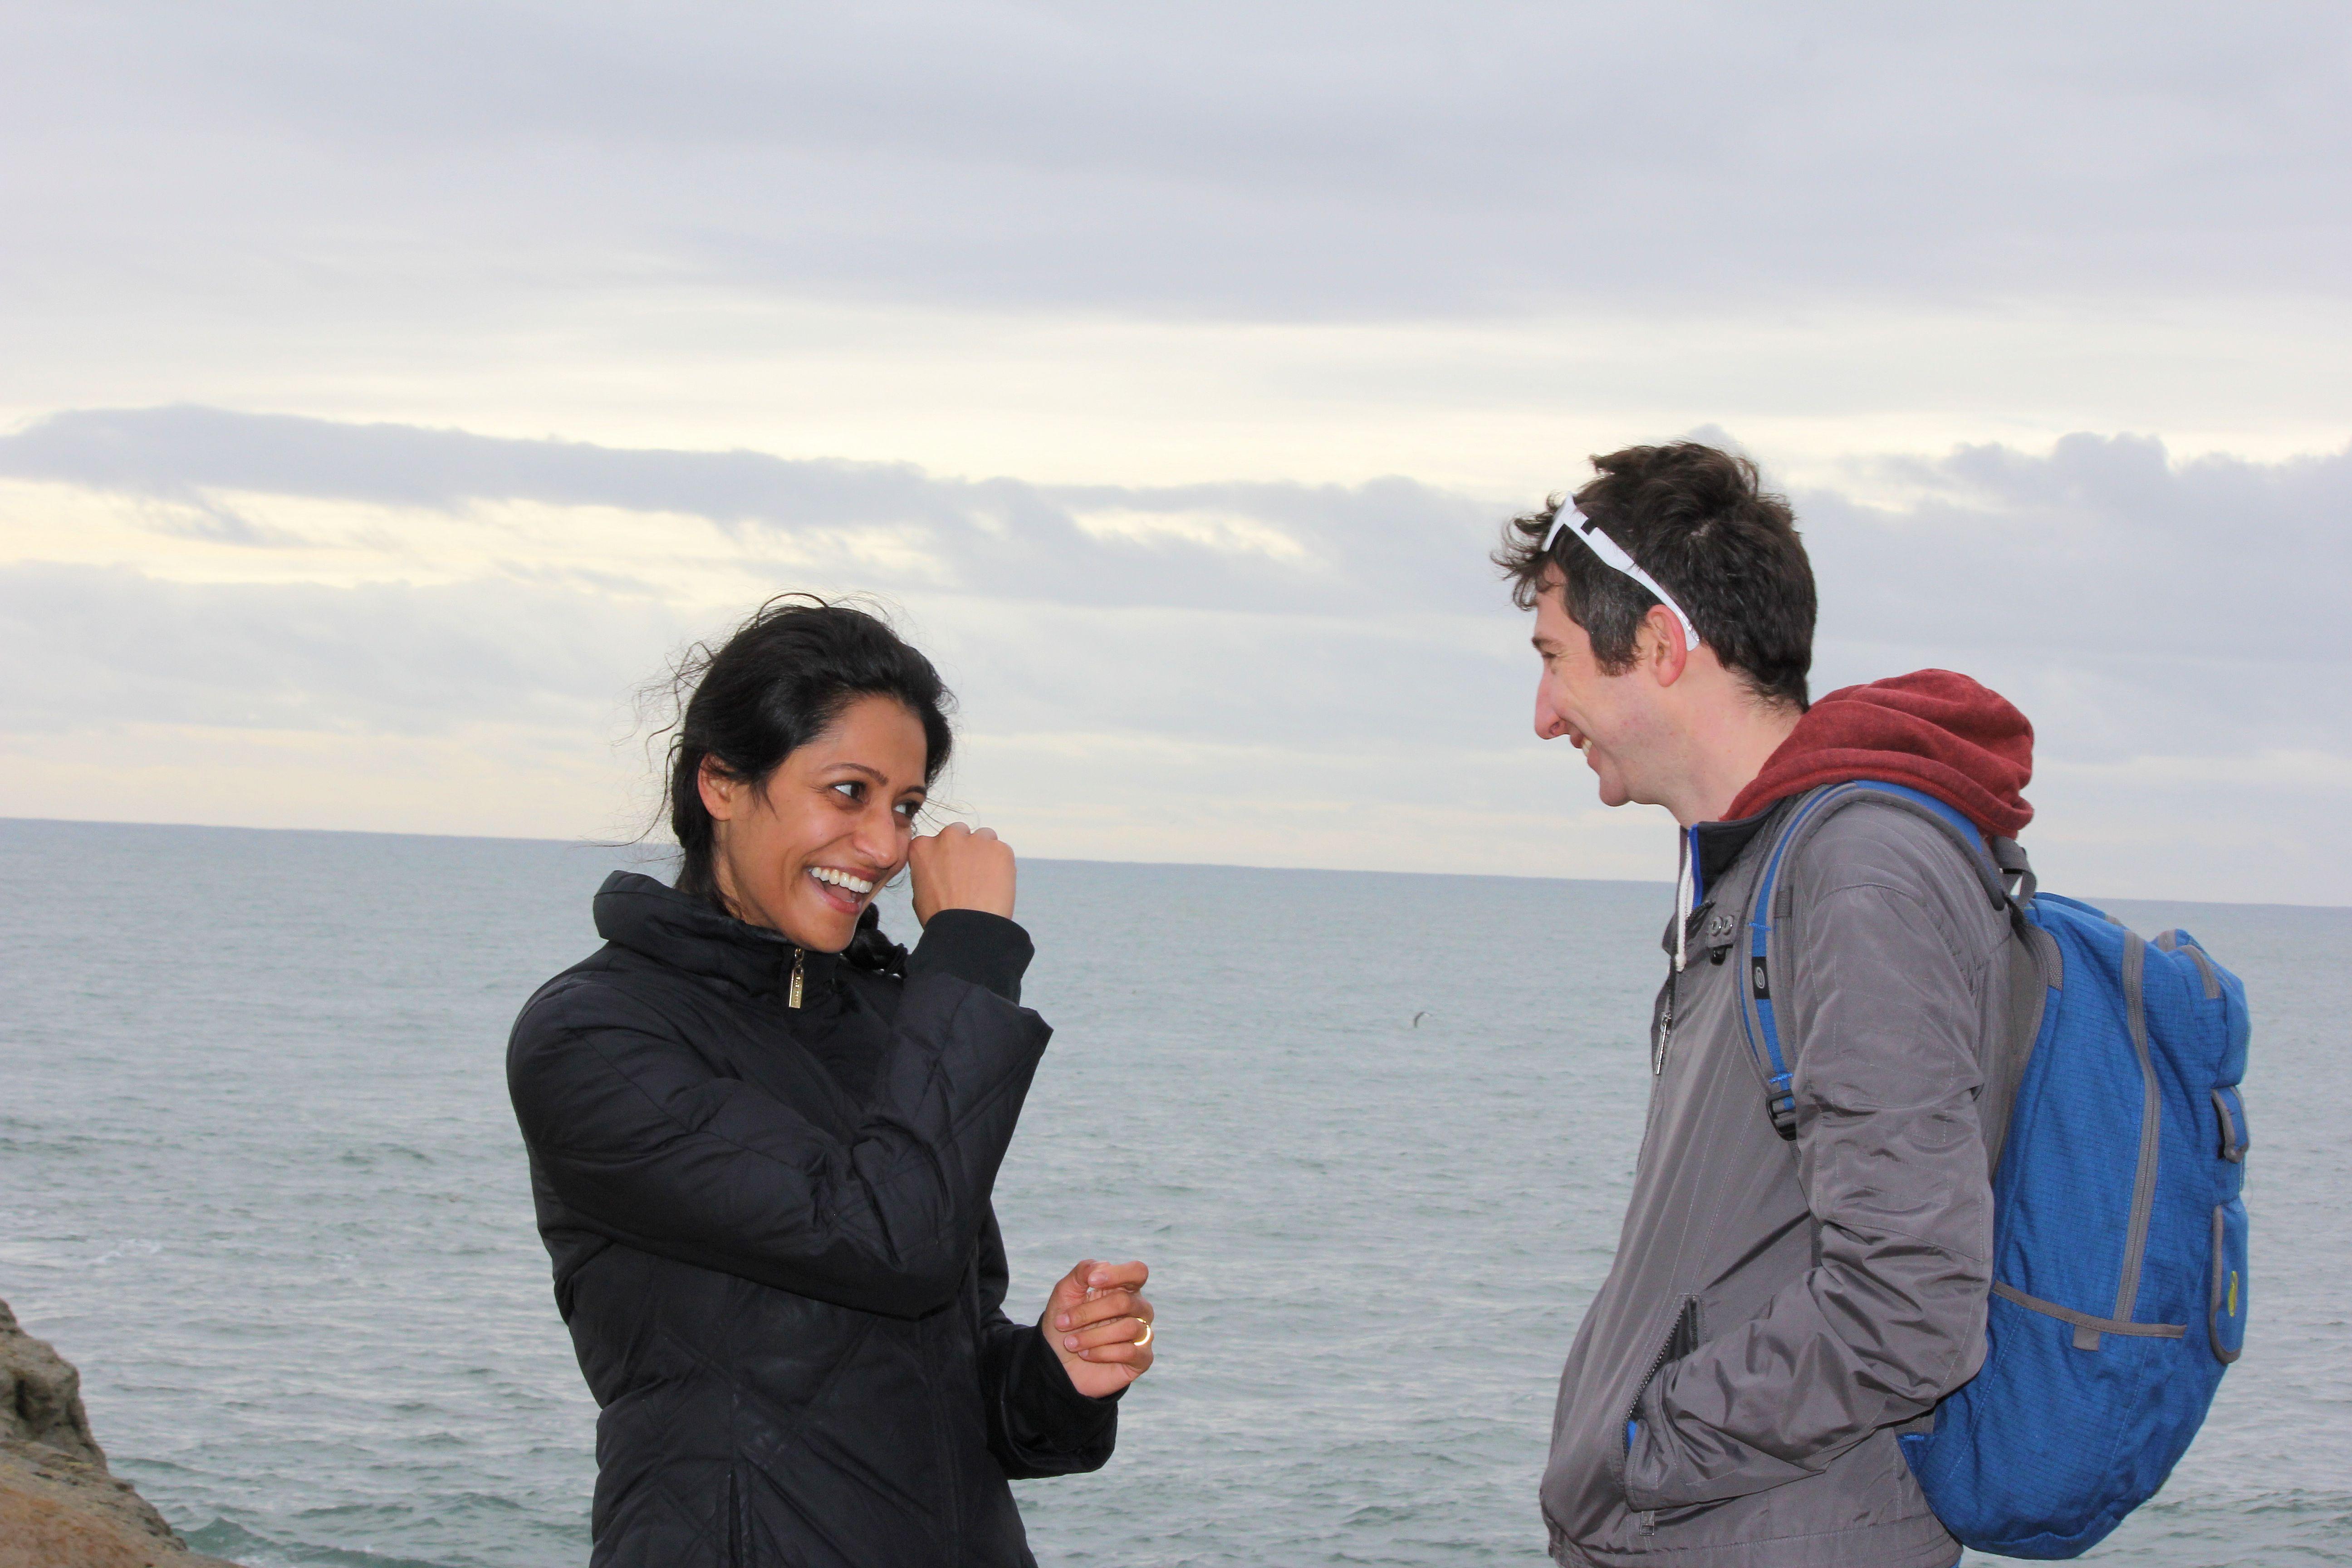 Happy tears wedding proposal photo